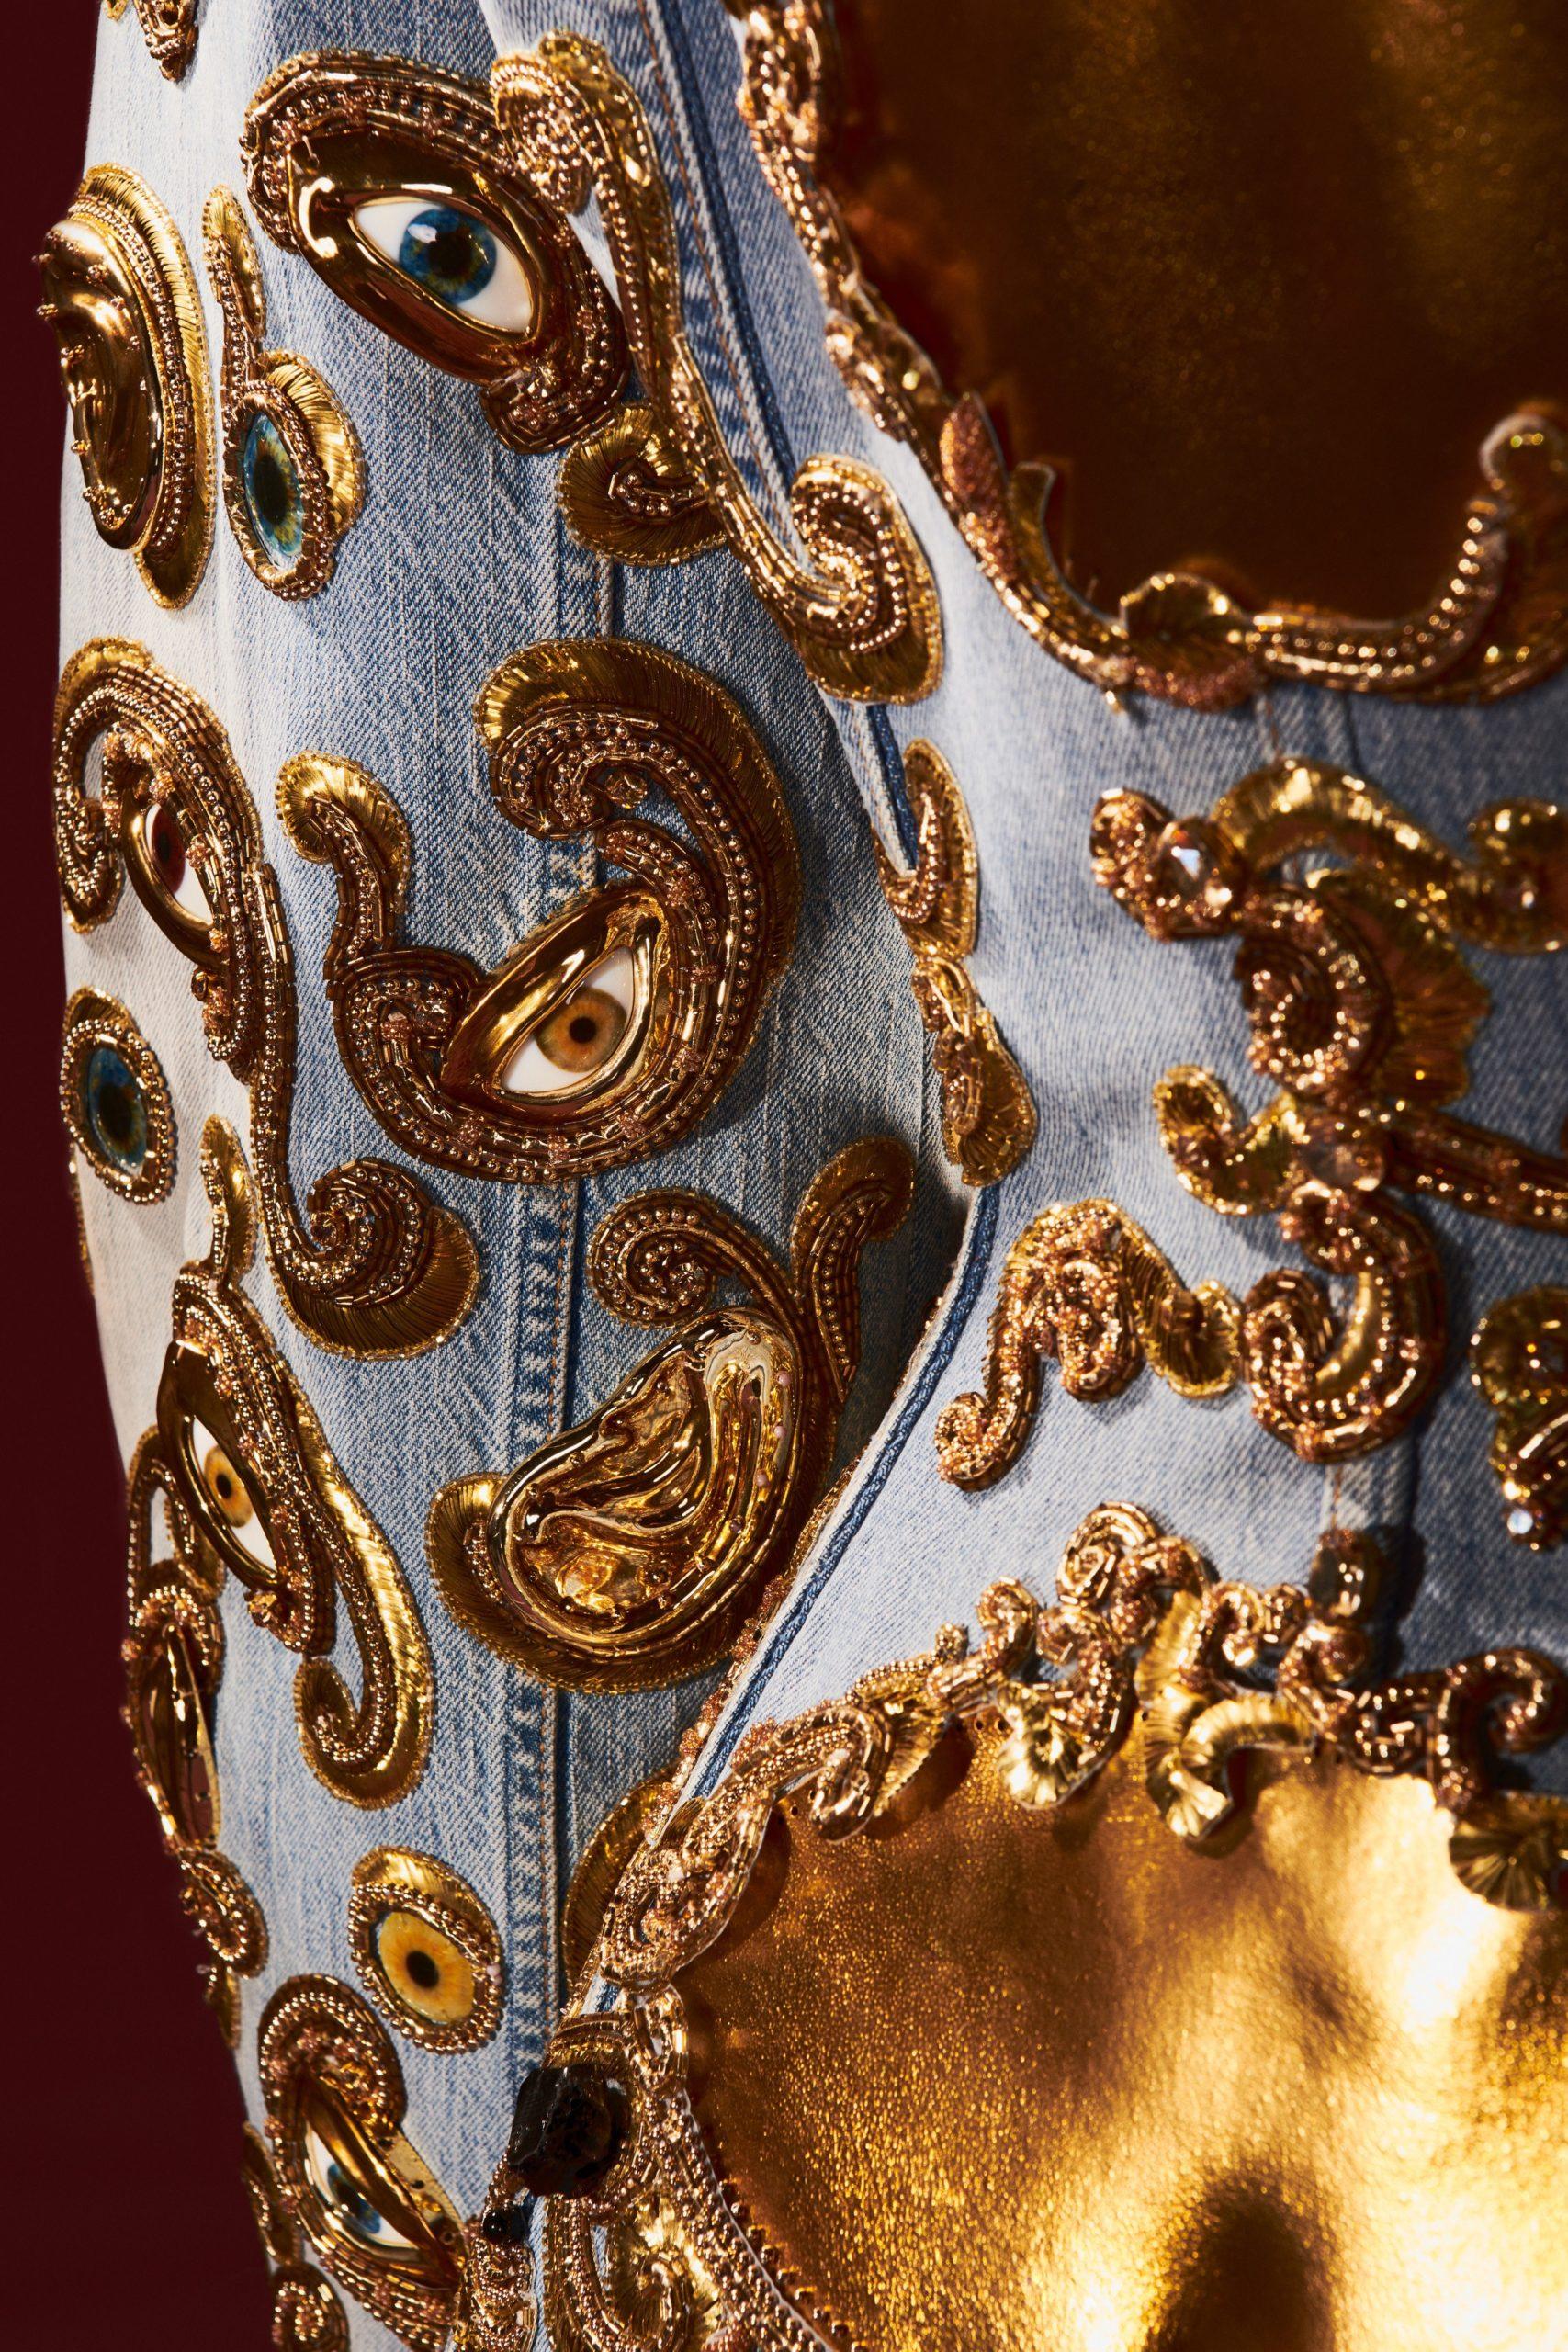 00009-Schiaparelli-Details-Couture-Fall-21-credit-Daniel-Roseberry-brand